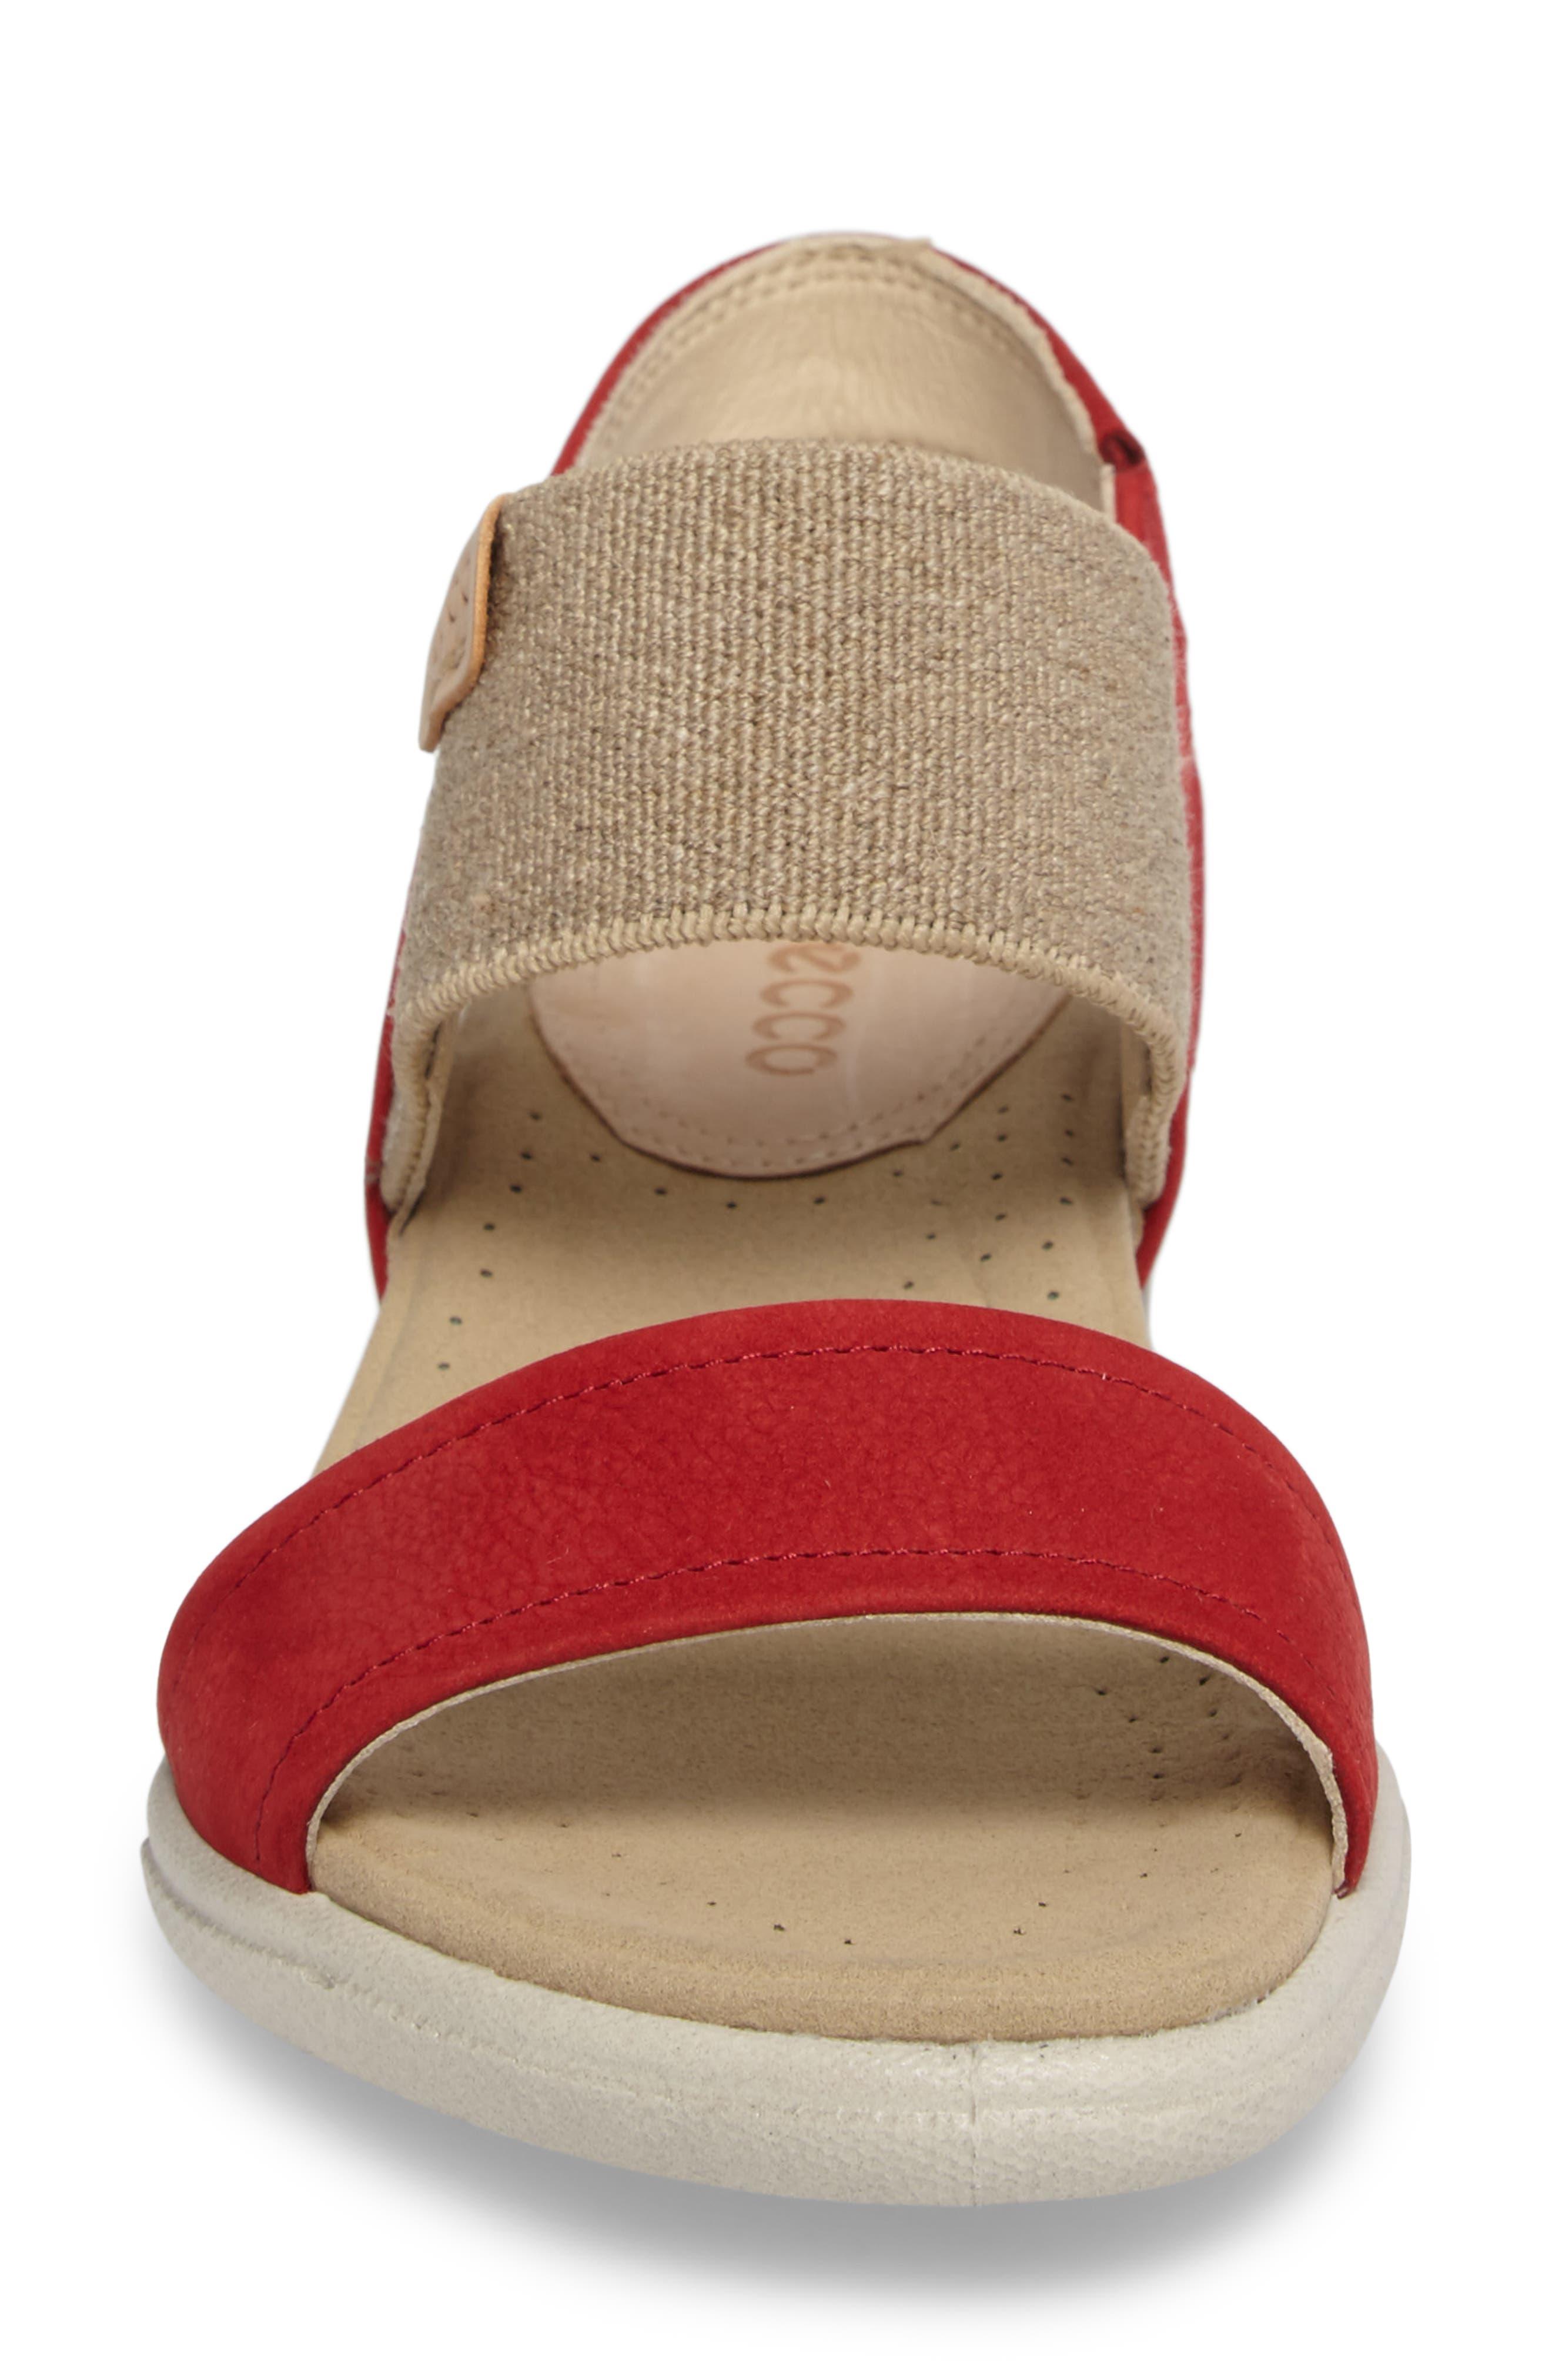 'Damara' Sandal,                             Alternate thumbnail 4, color,                             CHILI RED LEATHER